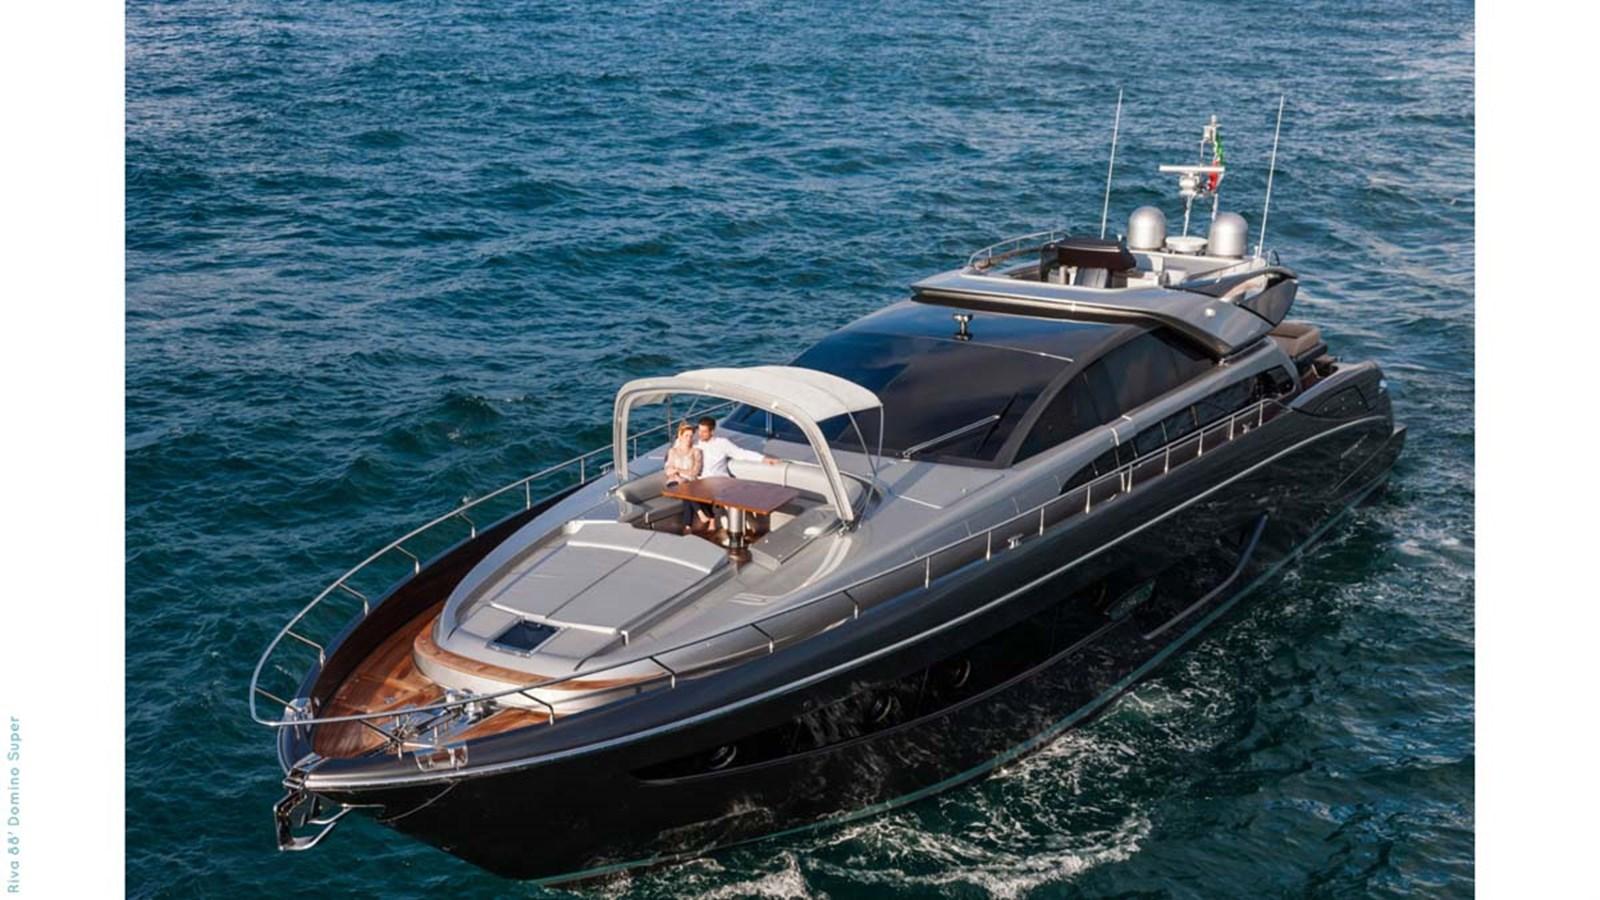 8696-Riva 88 Domino Super 2017 RIVAL YACHTS INC  Motor Yacht 2851201